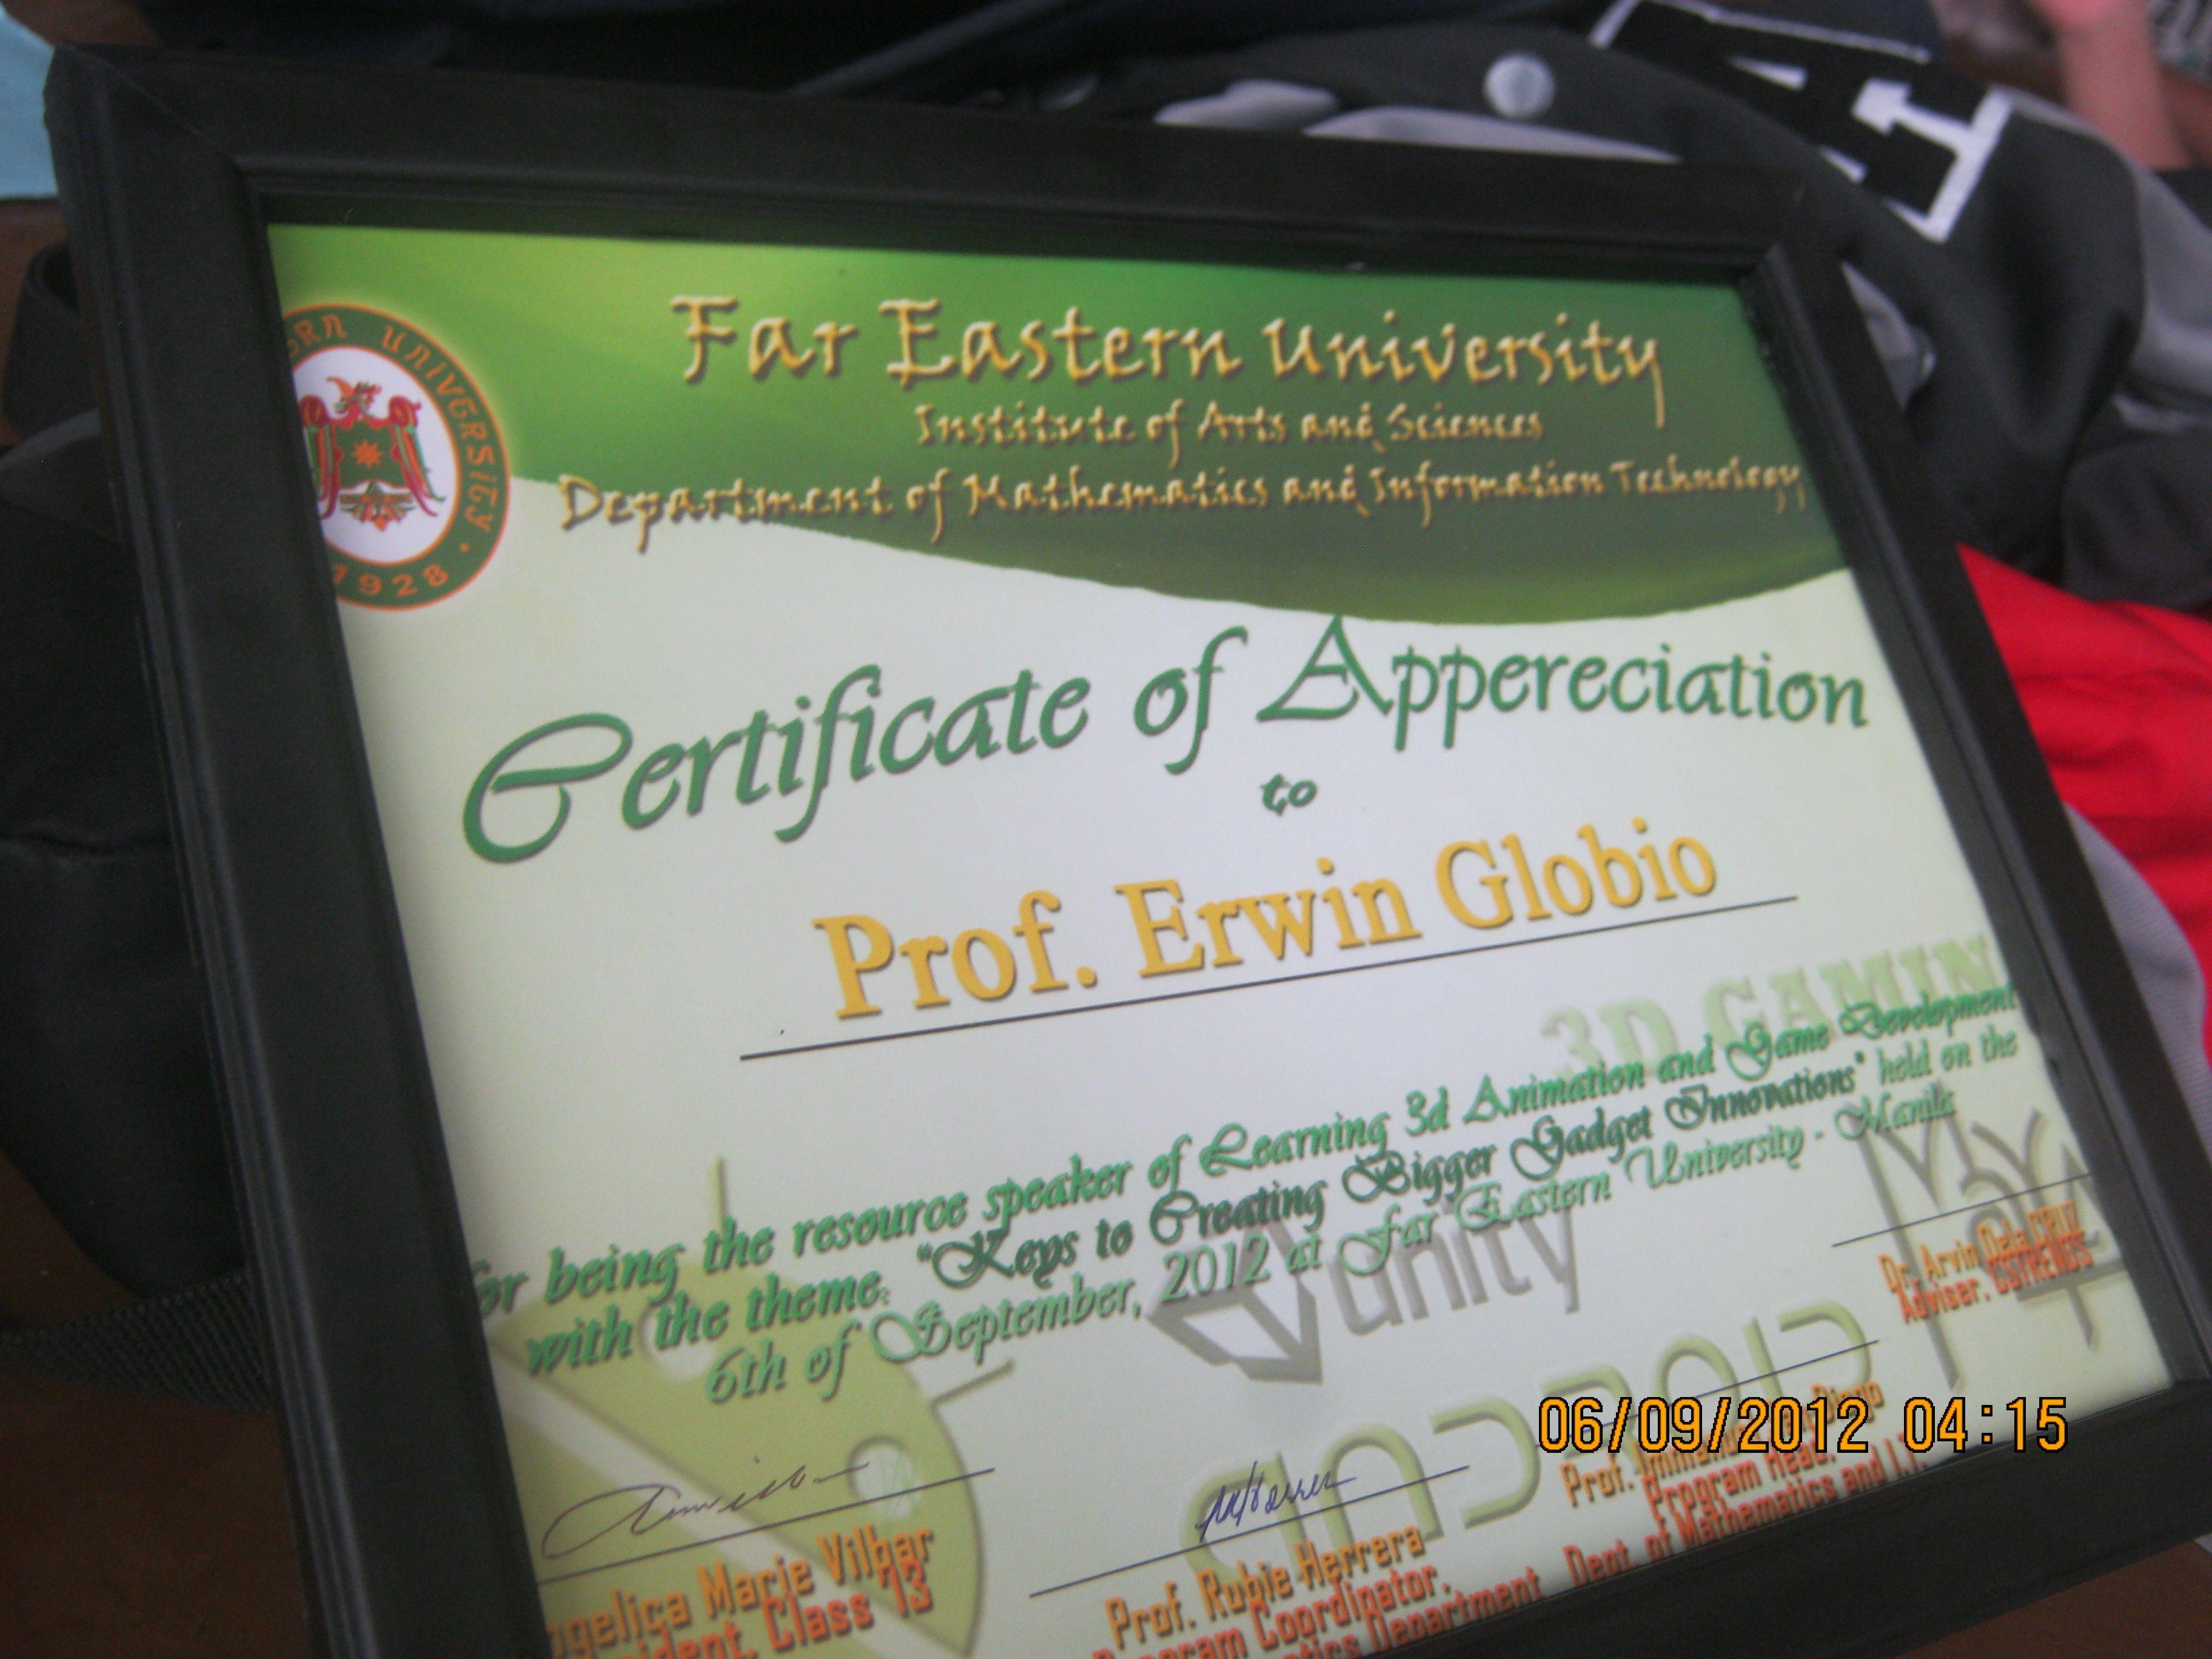 Prof erwin globios certificate of appreciation eglobiotraining erwin globios certificate of appreciation eglobiotraining yelopaper Gallery